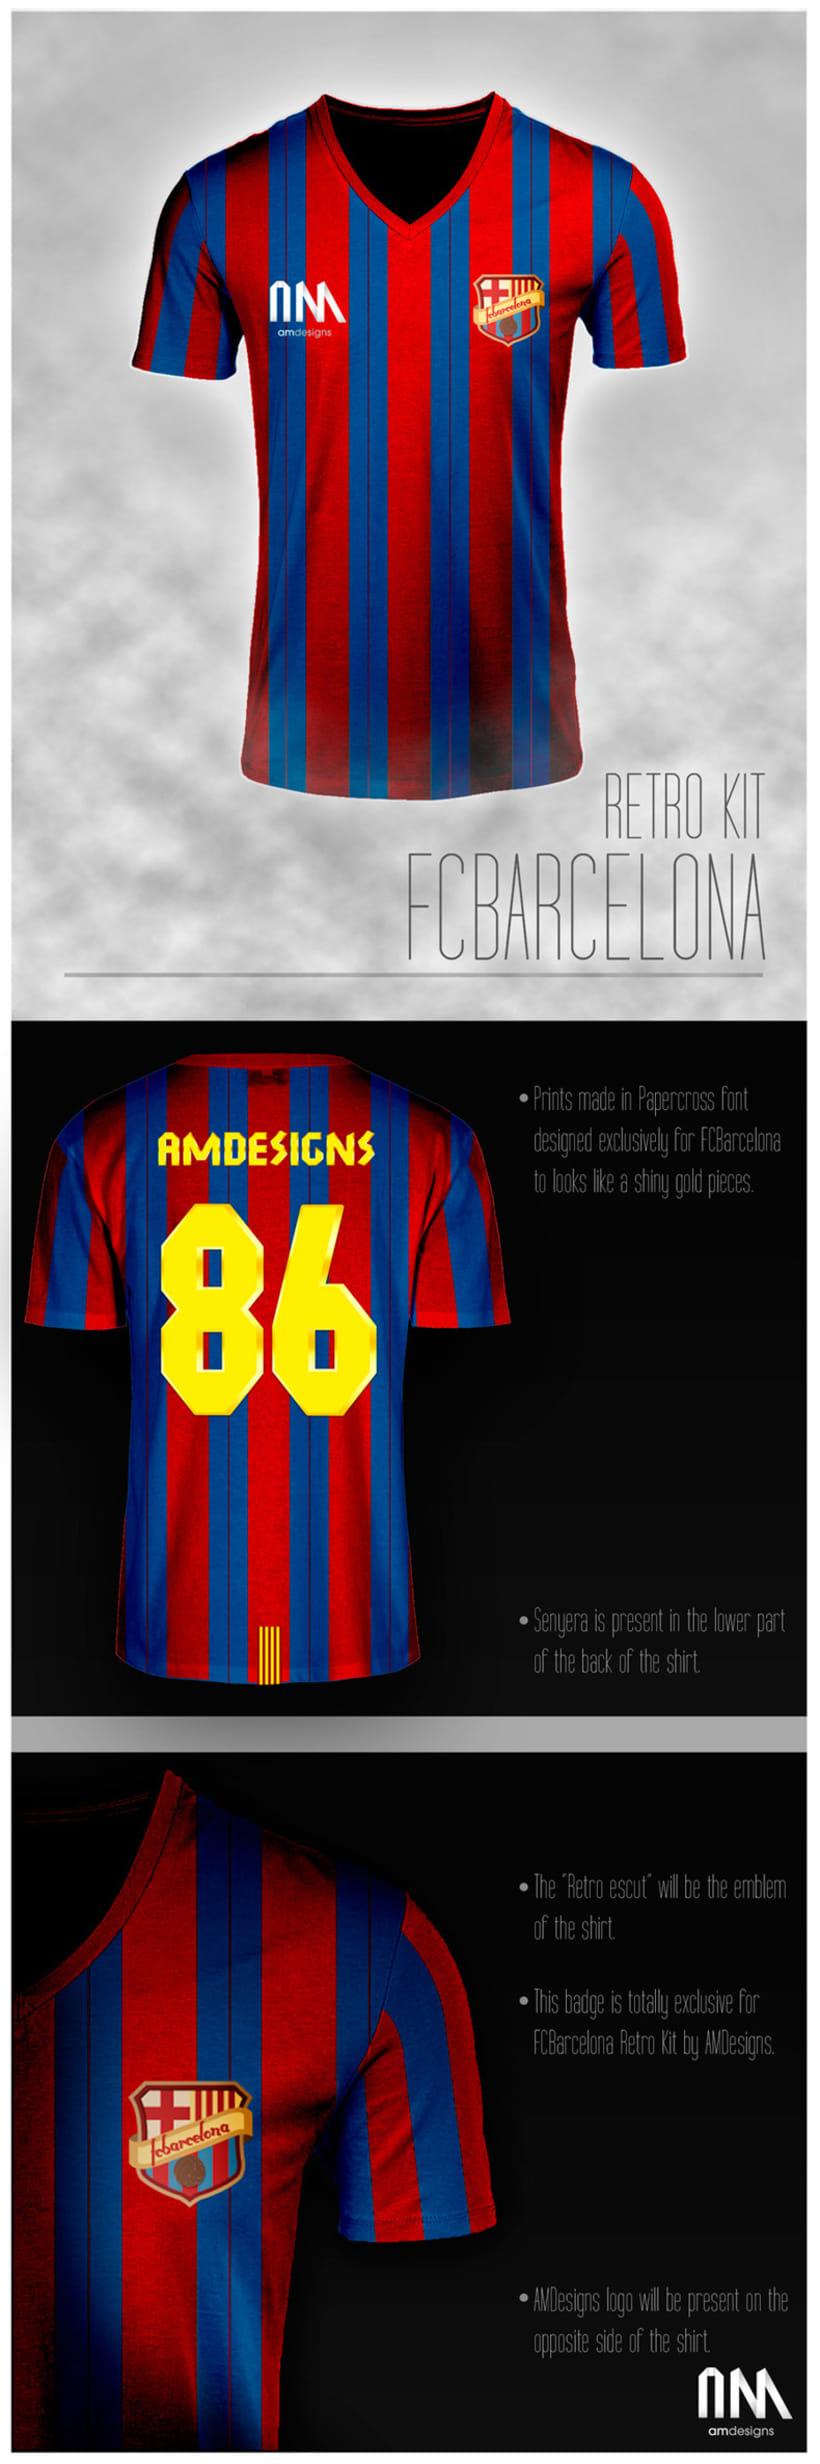 FCBarcelona 9